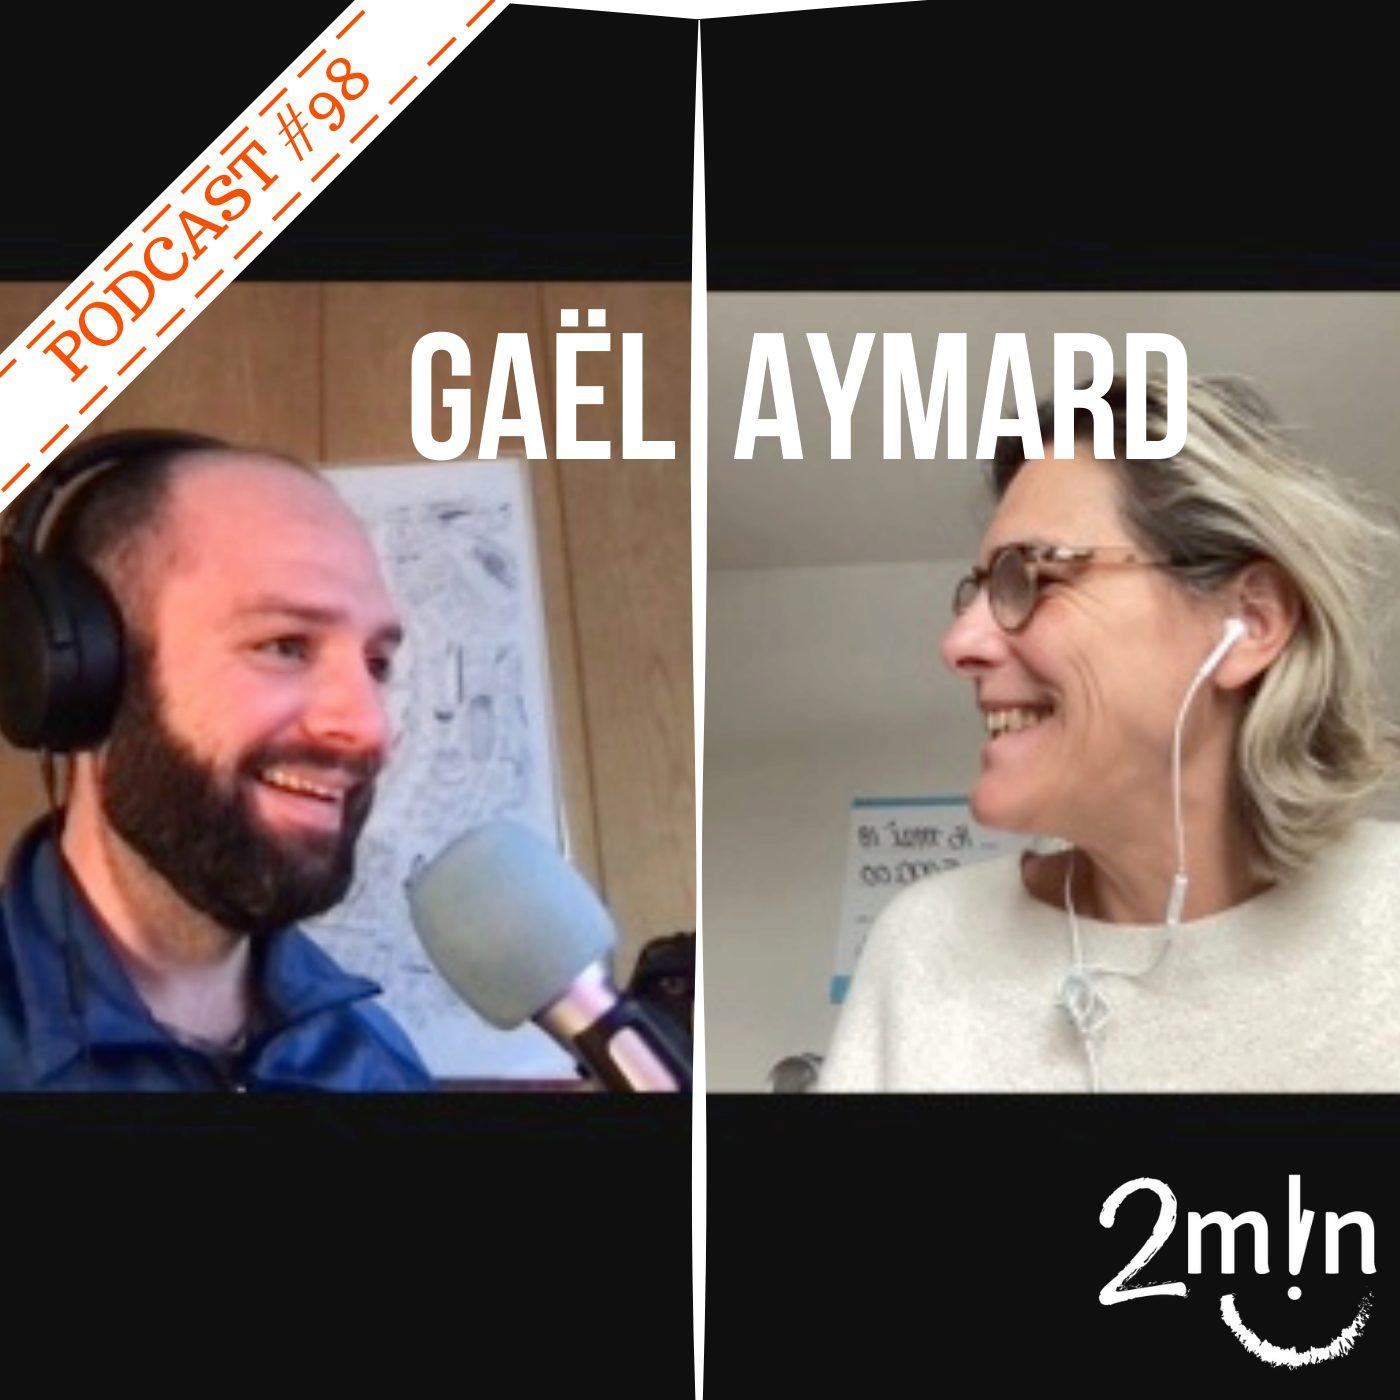 BdeB #98 Du bonheur avec Gaël Aymard